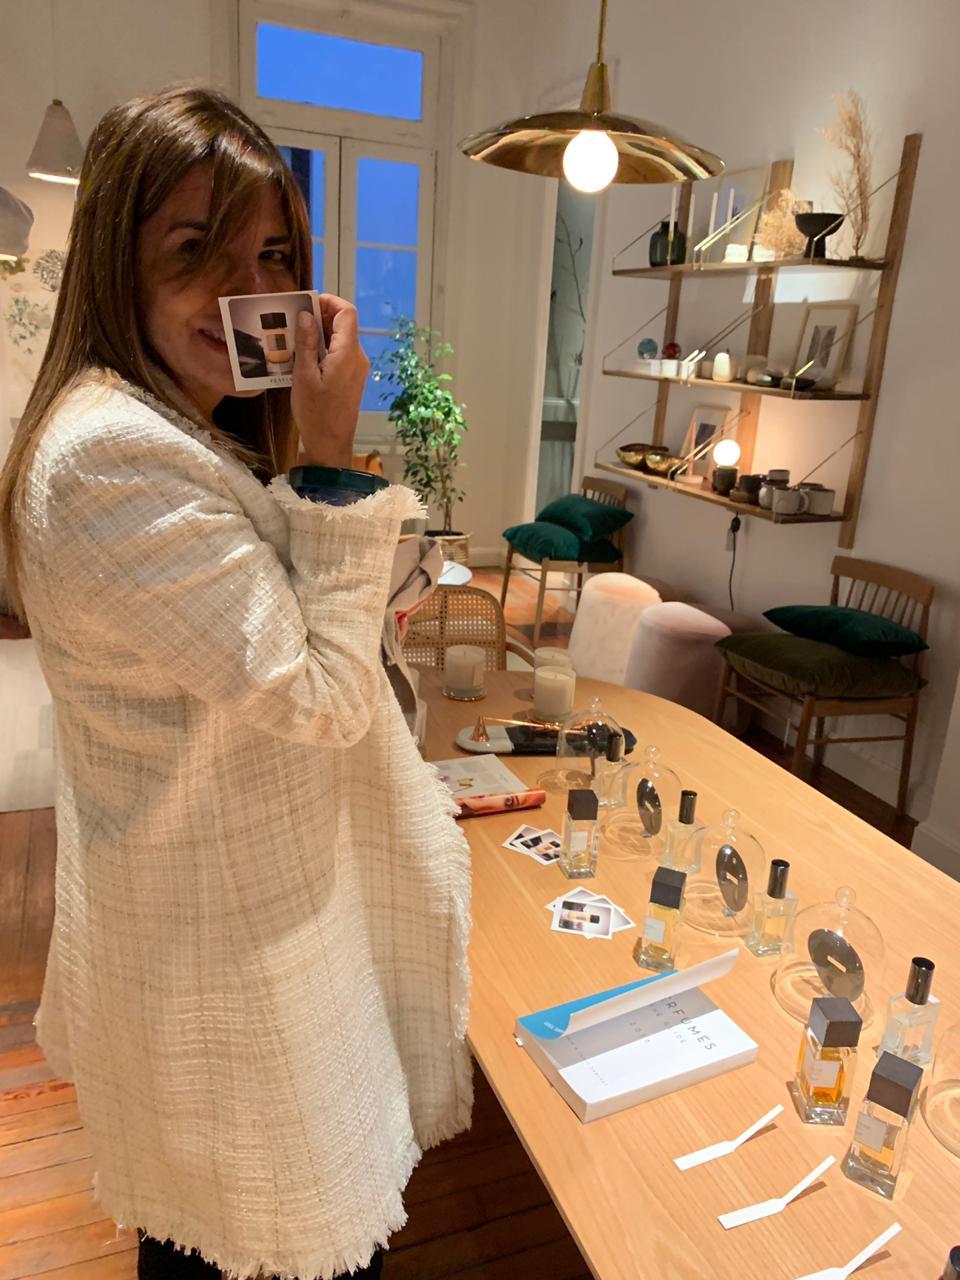 Barbara Bertone Rue des Artisans - Frassai perfumes de autor & Astor Buenos Aires Agosto 2019